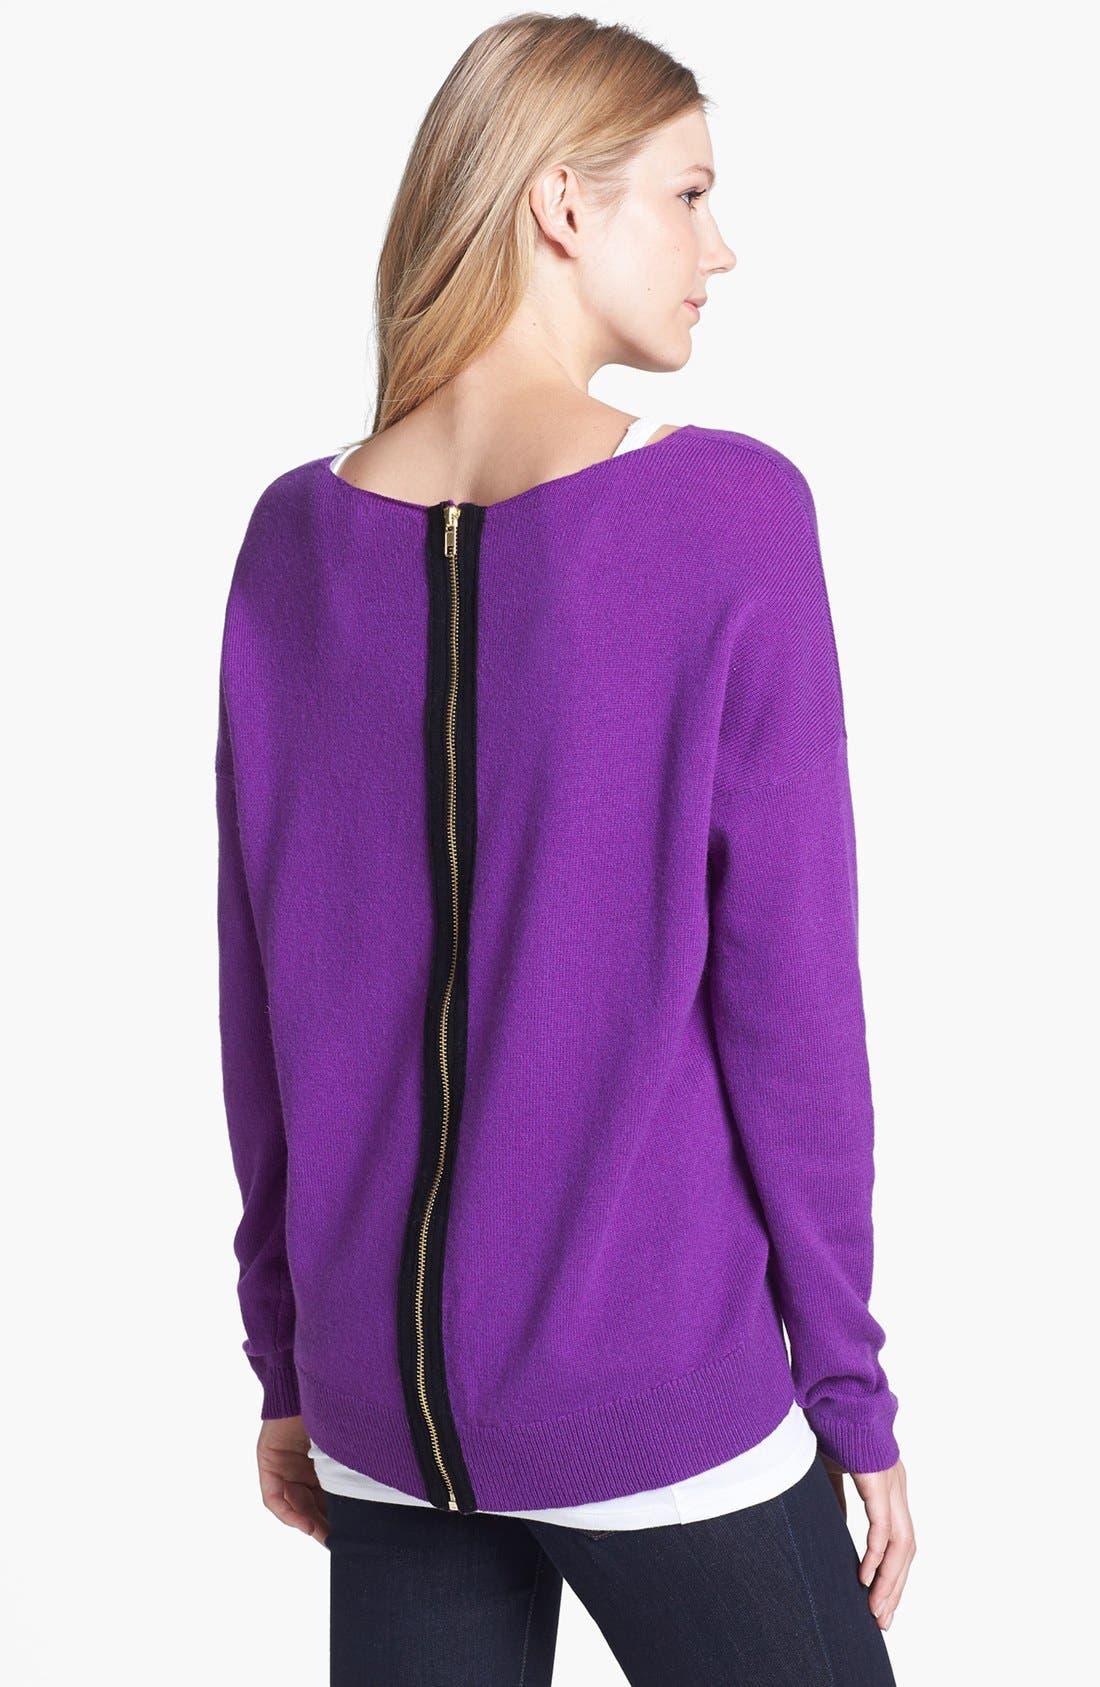 Alternate Image 2  - Halogen® Wool & Cashmere Back Zip Sweater (Petite)